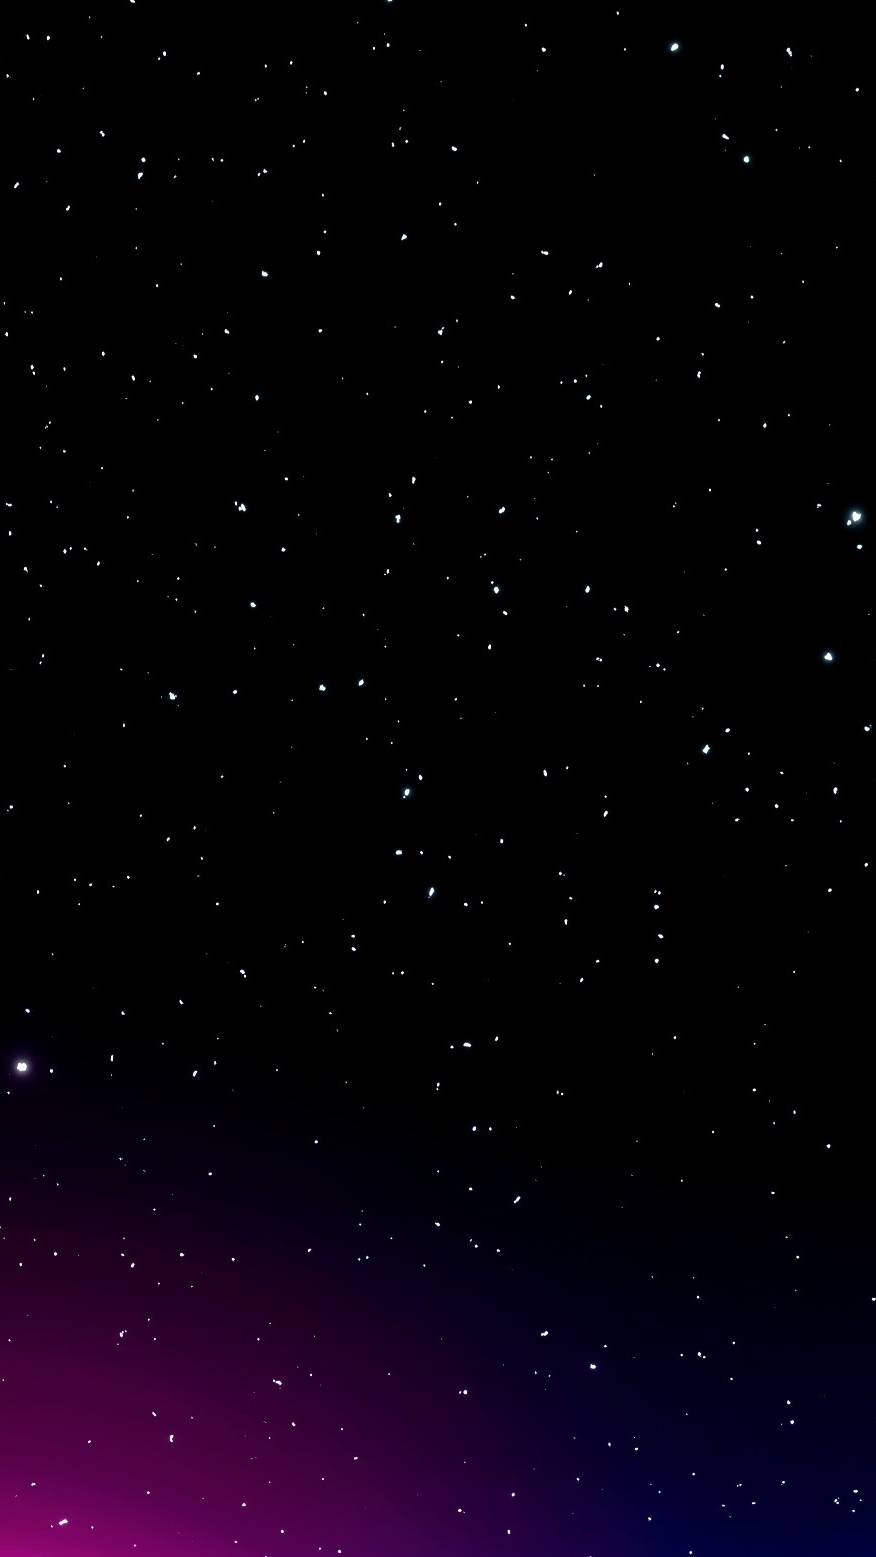 Deep Dark Space Stars iPhone Wallpaper